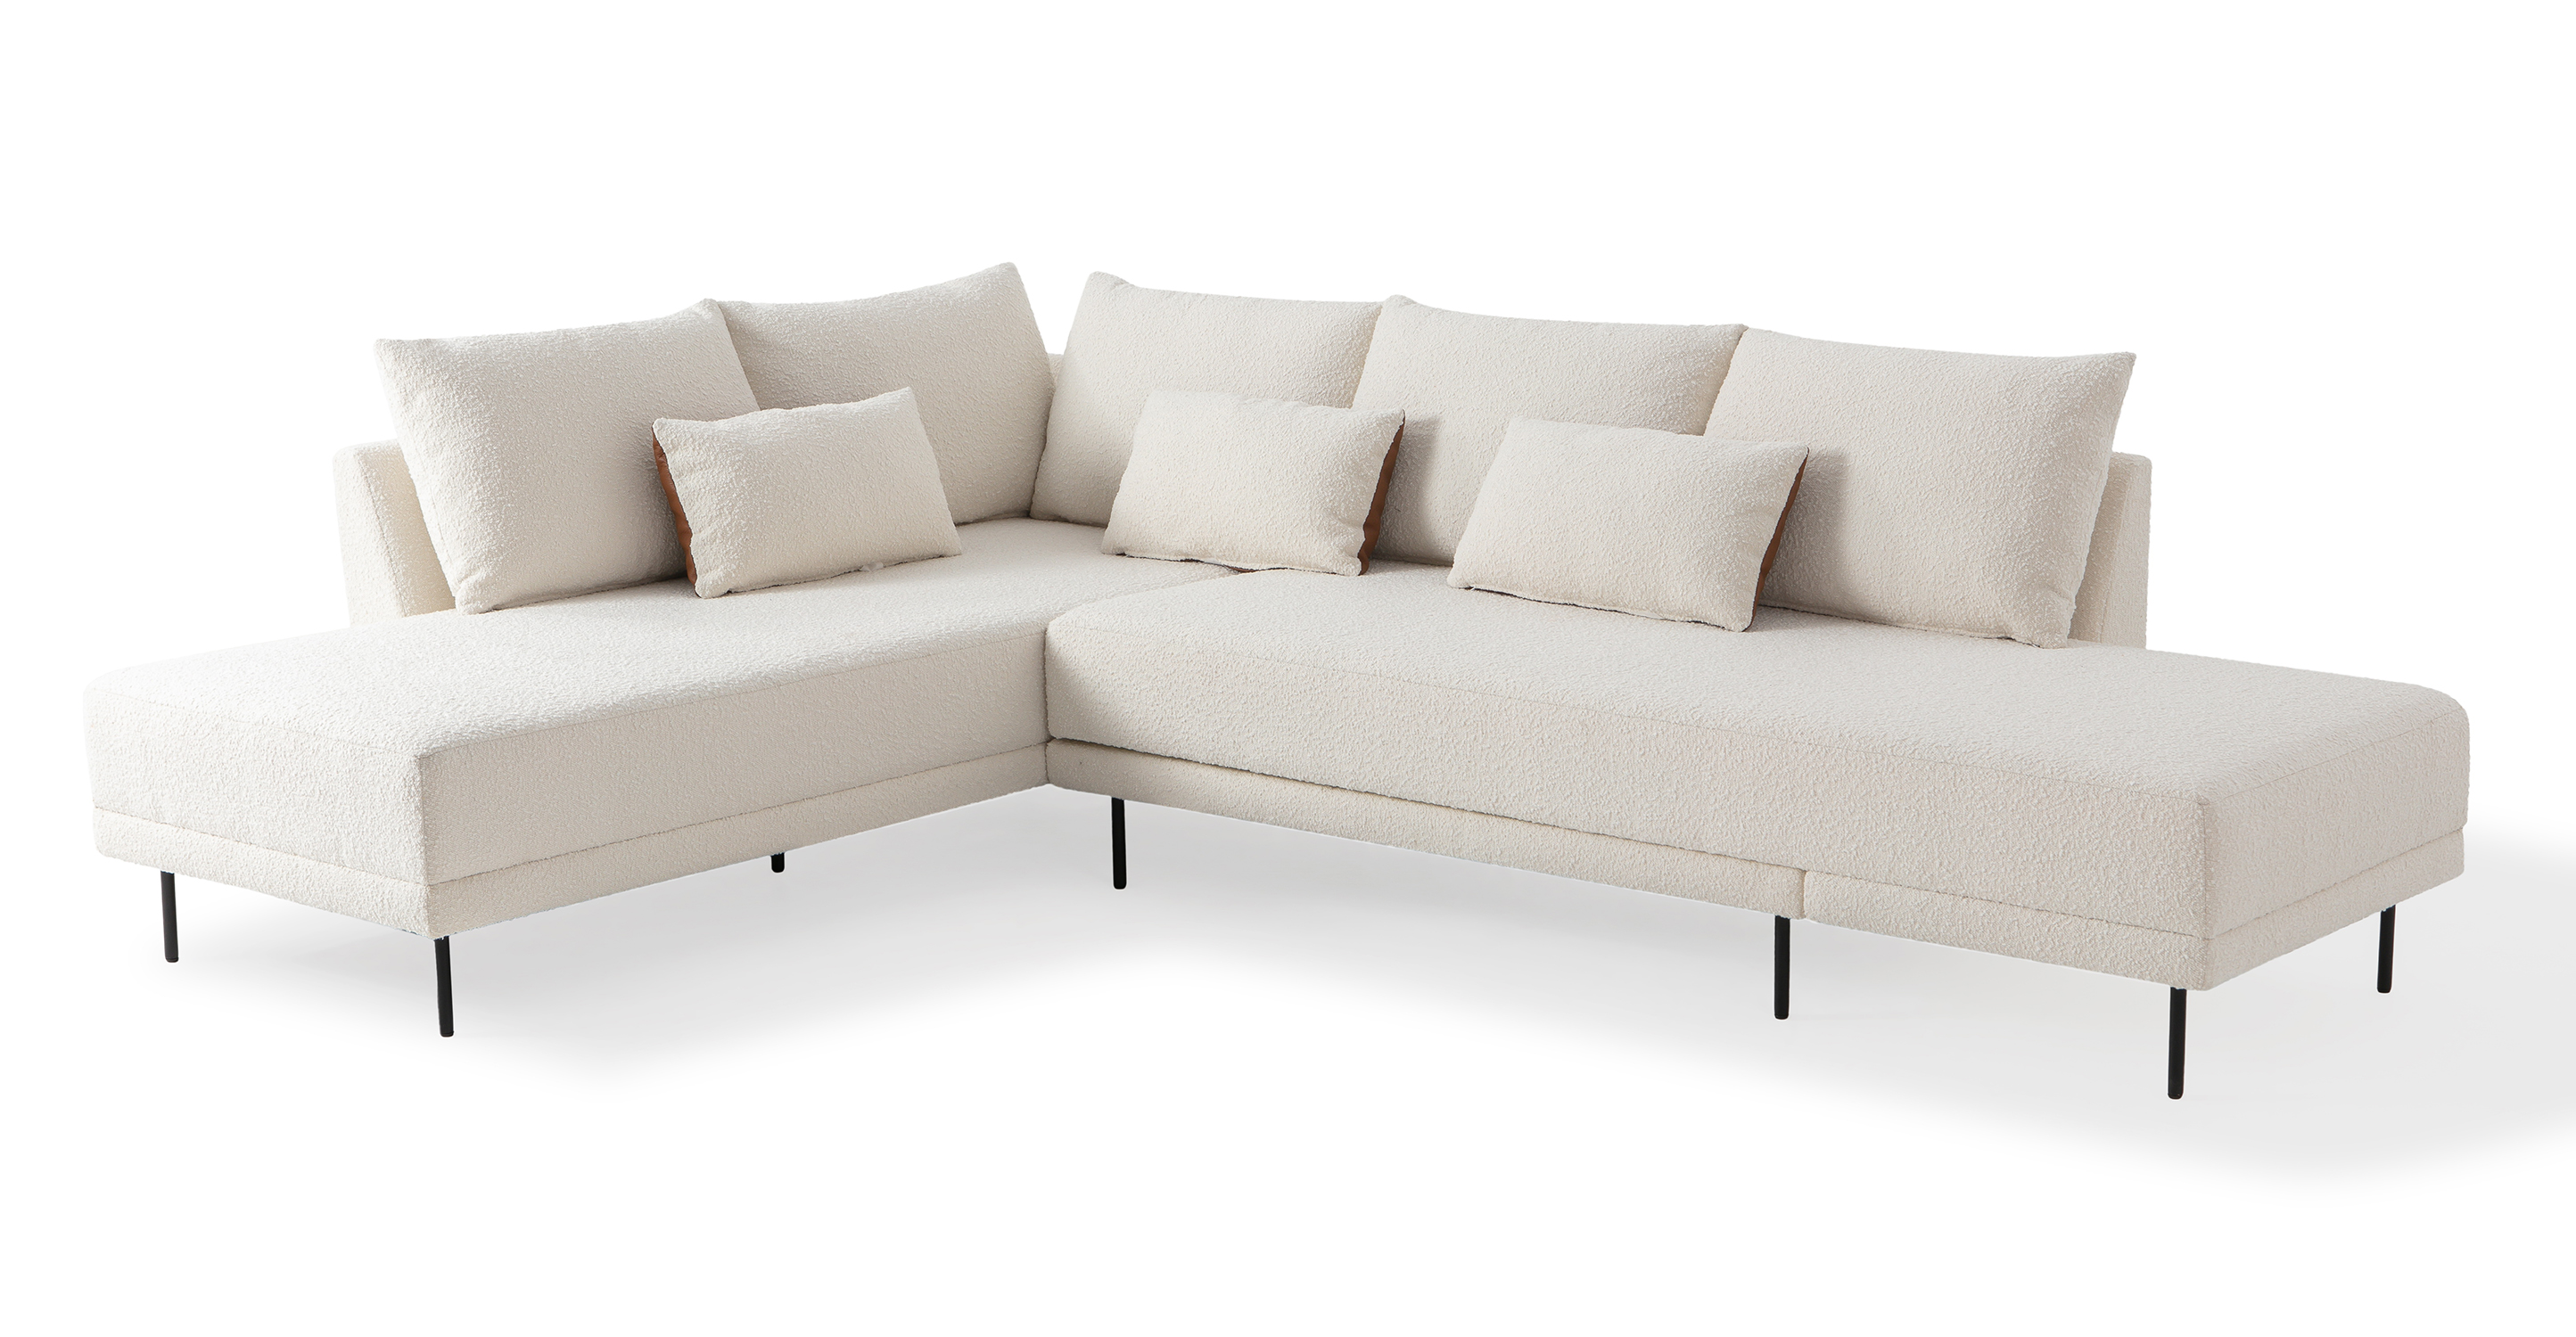 "Stash 117"" Fabric Sectional Sleeper, Blanc & Bronze"